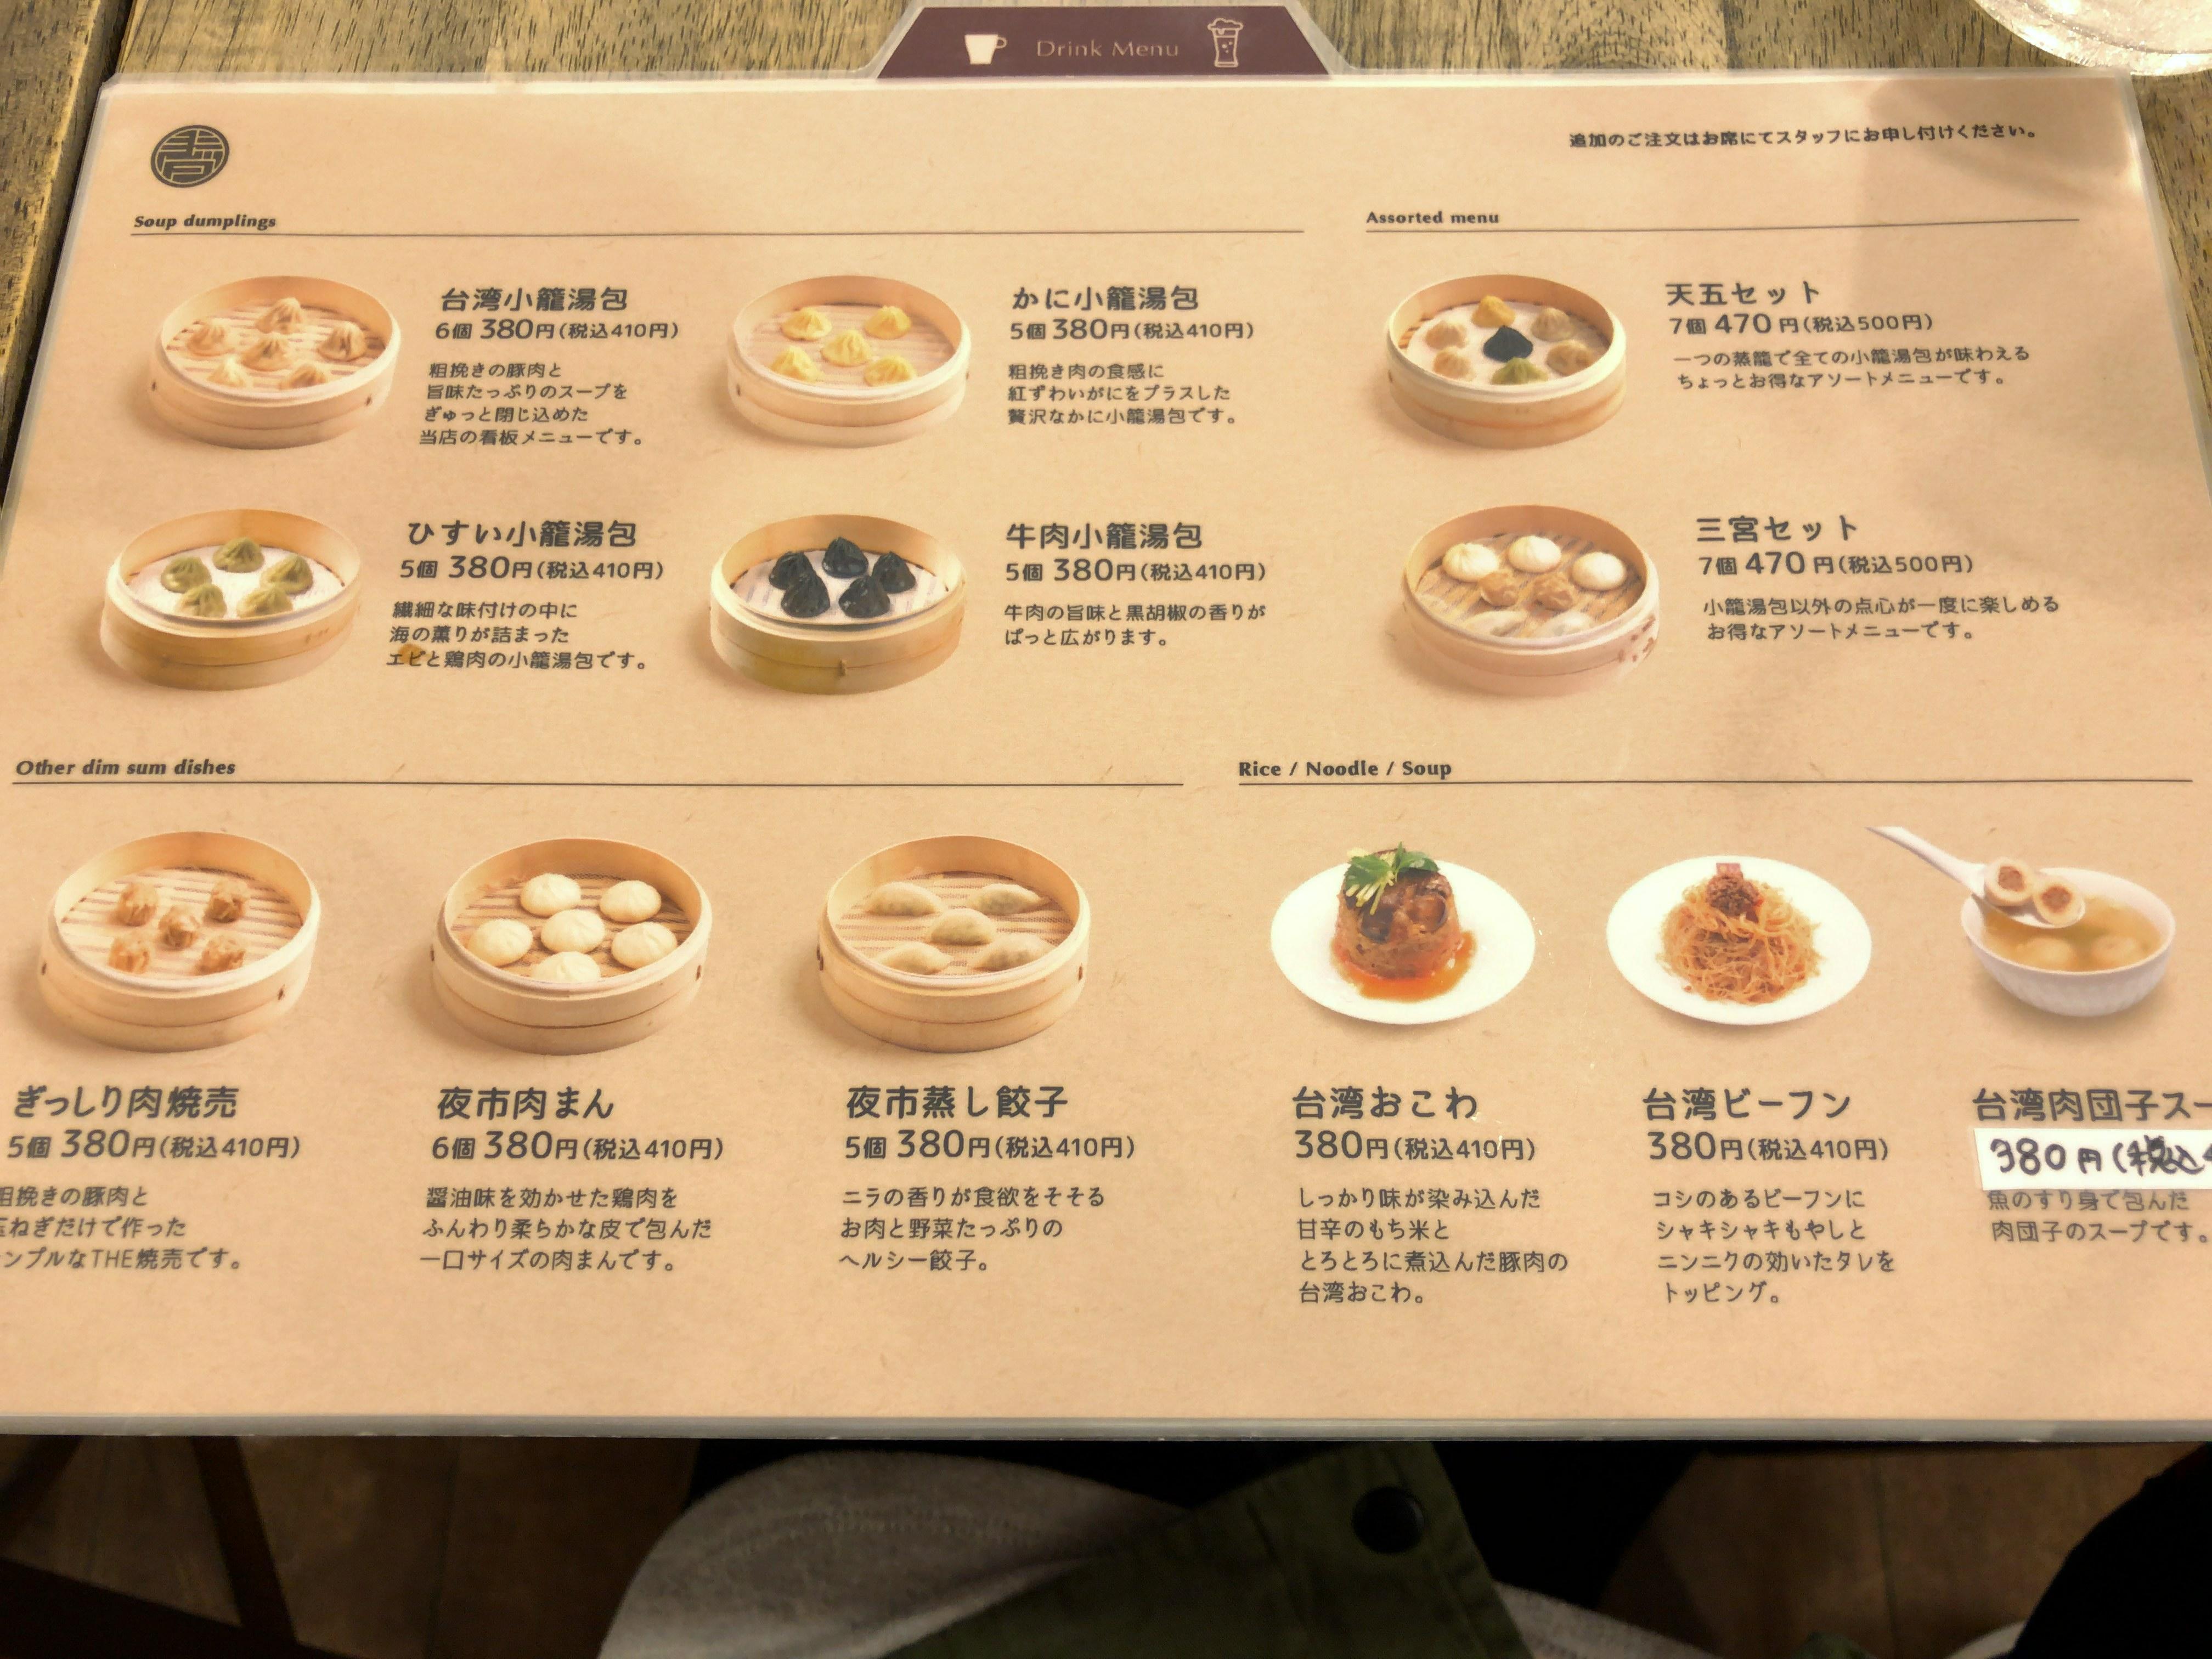 taiwantanpao-menu1